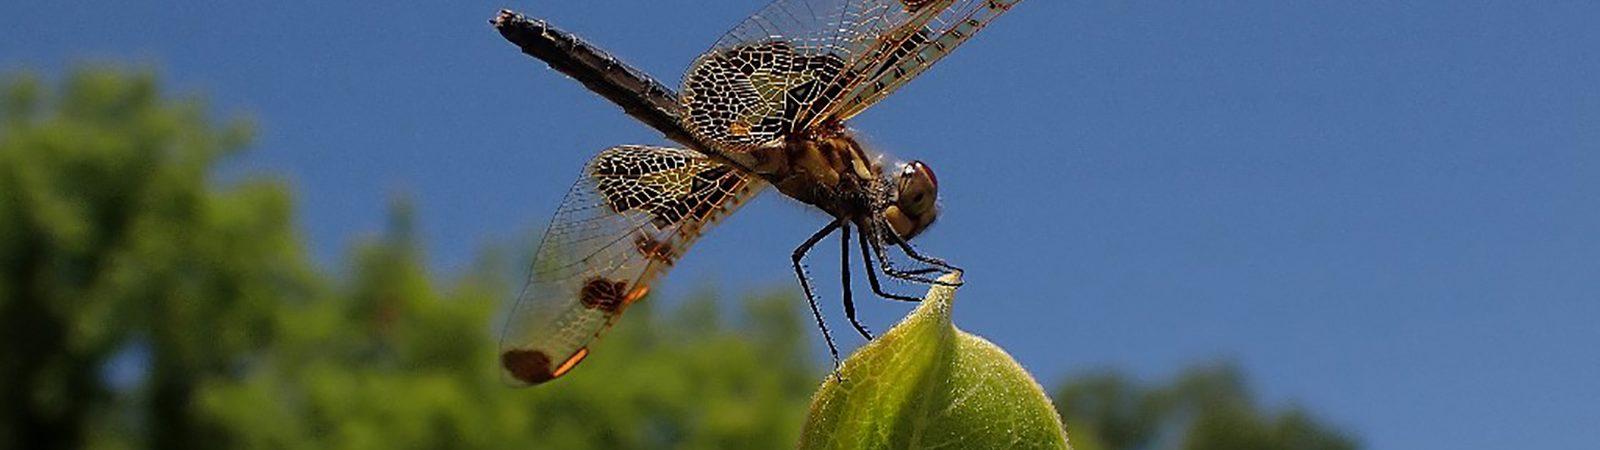 Calico dragonfly. Photo taken by Emily M. Stone